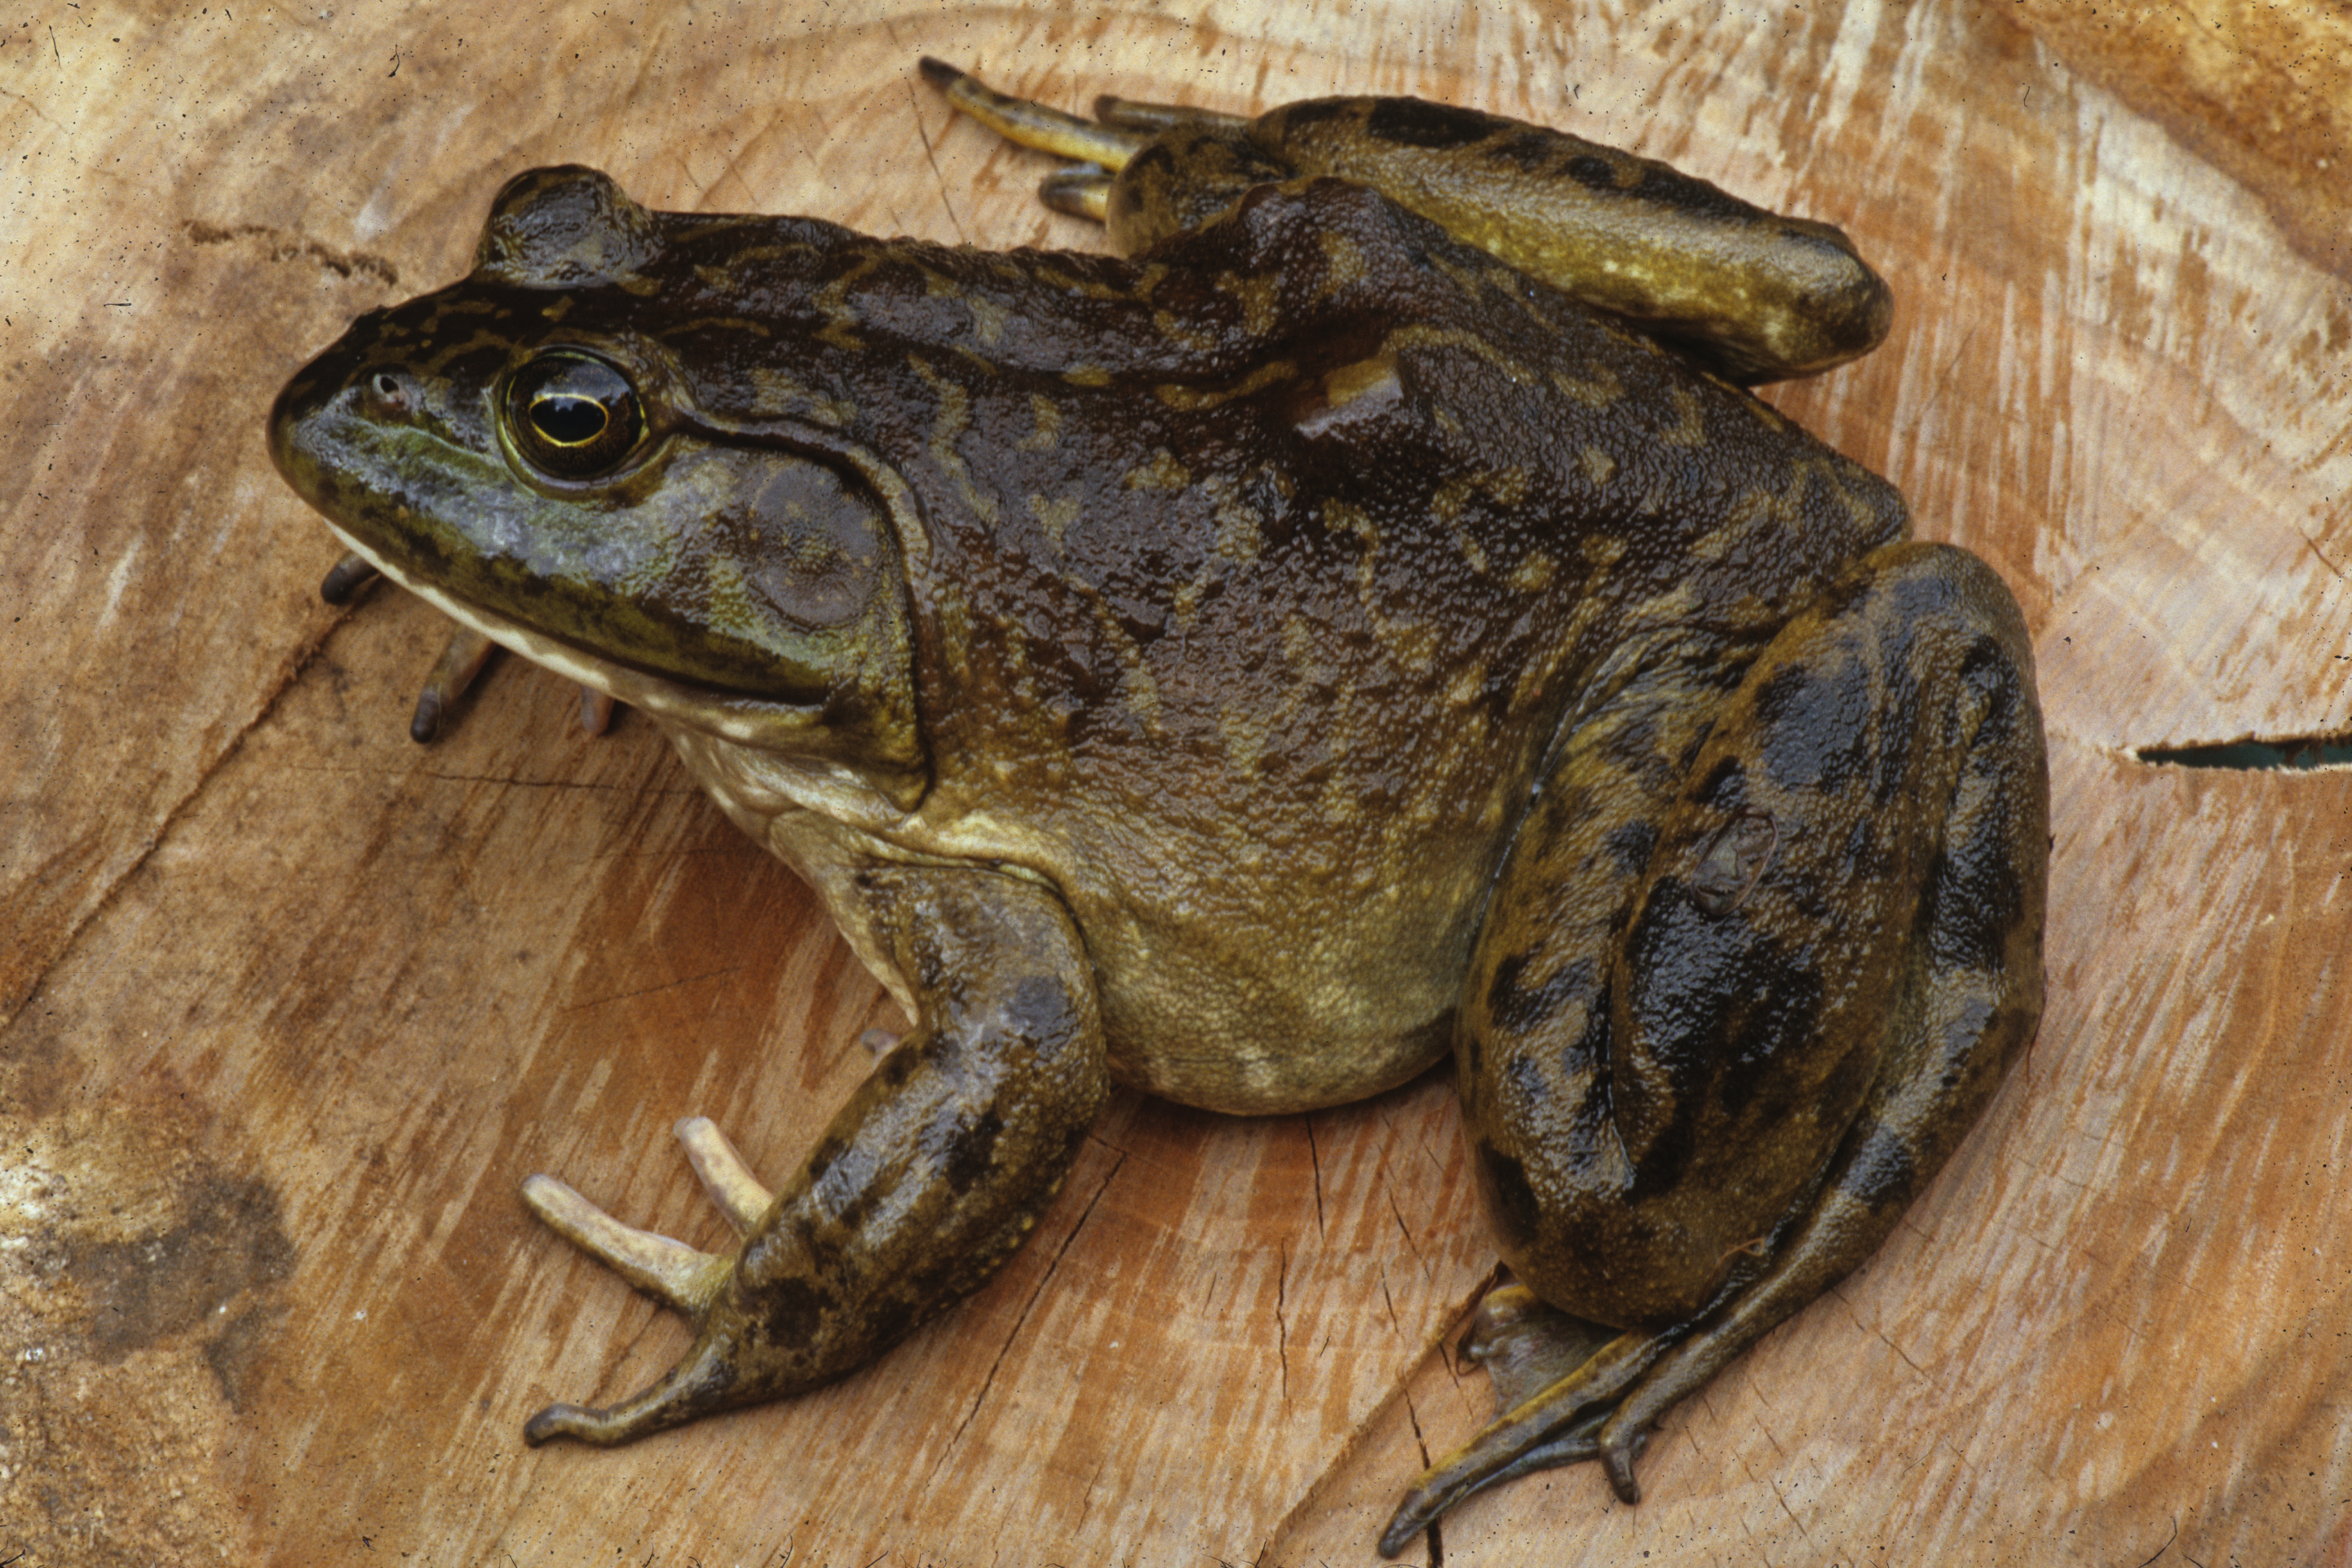 Link to OK Amphibian Disease Testing